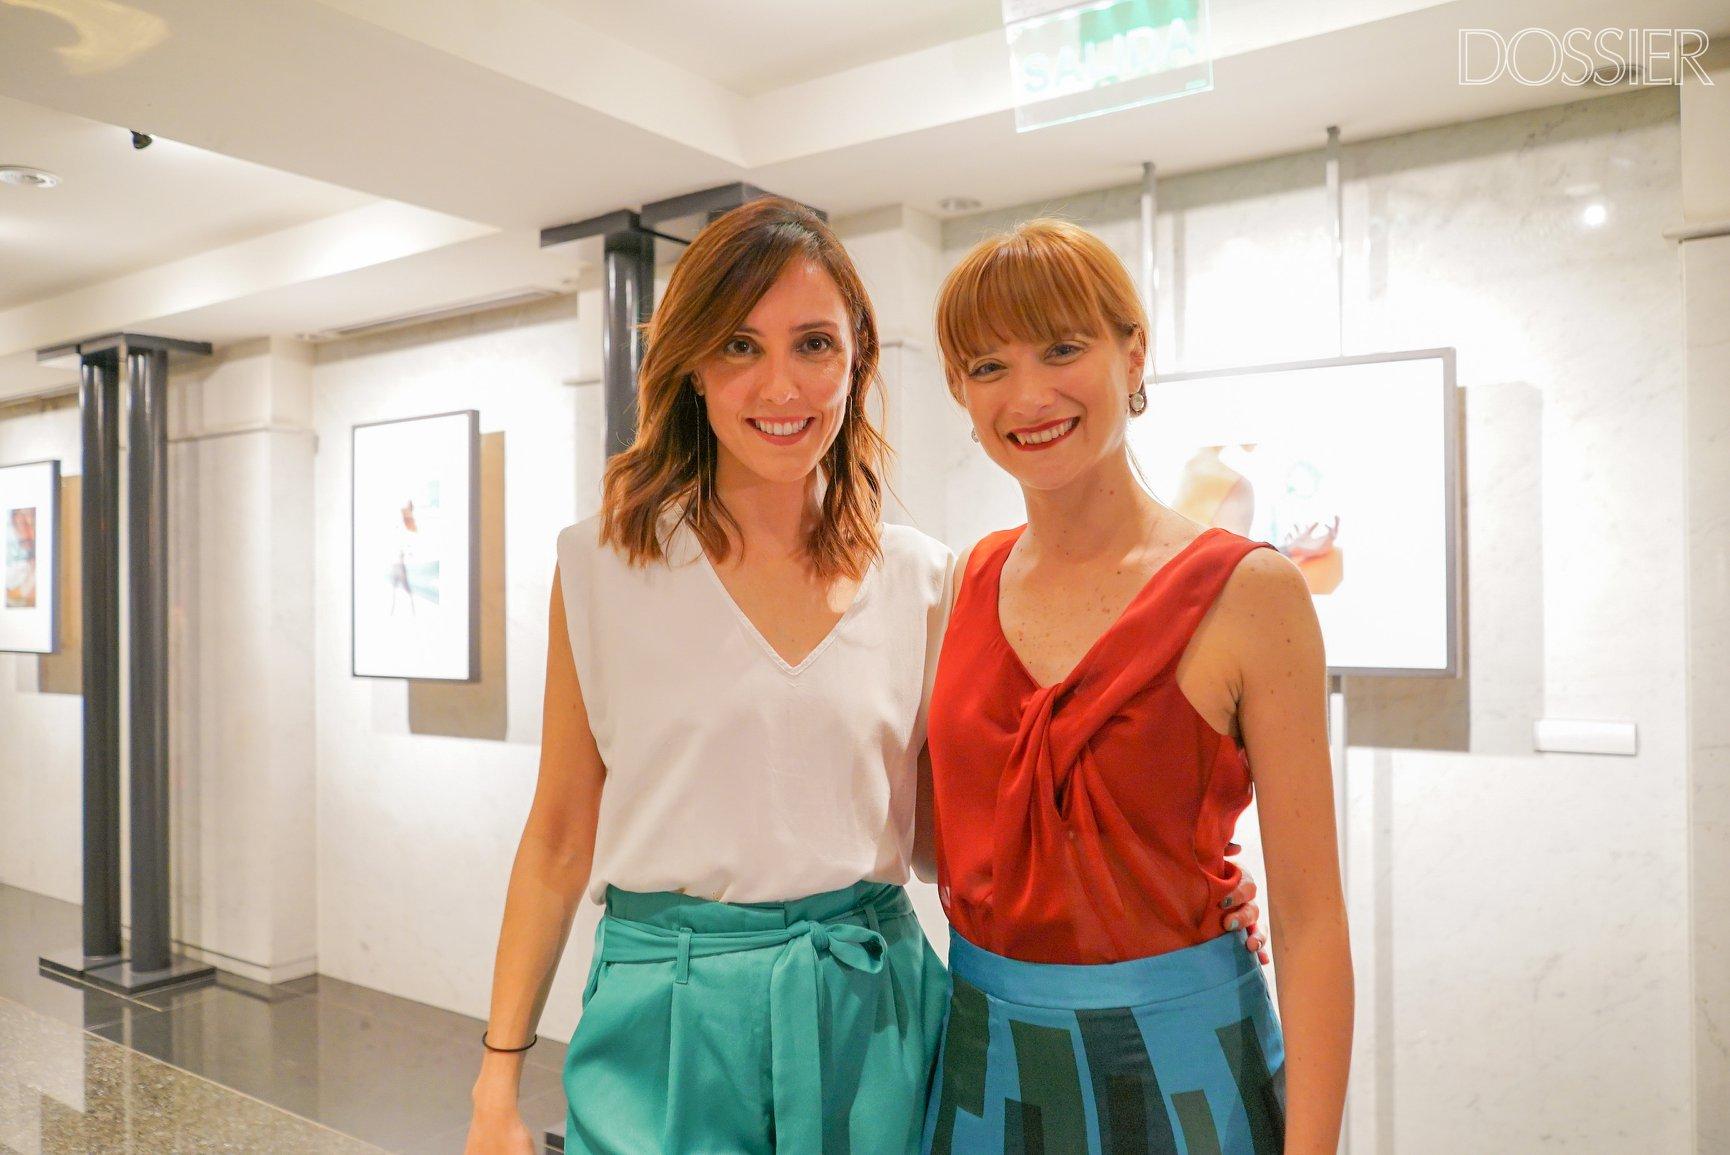 La fotógrafa Laura Abad junto a la bailarina Giovanna Martinatto / foto de la inauguración por Celeste Carnevale